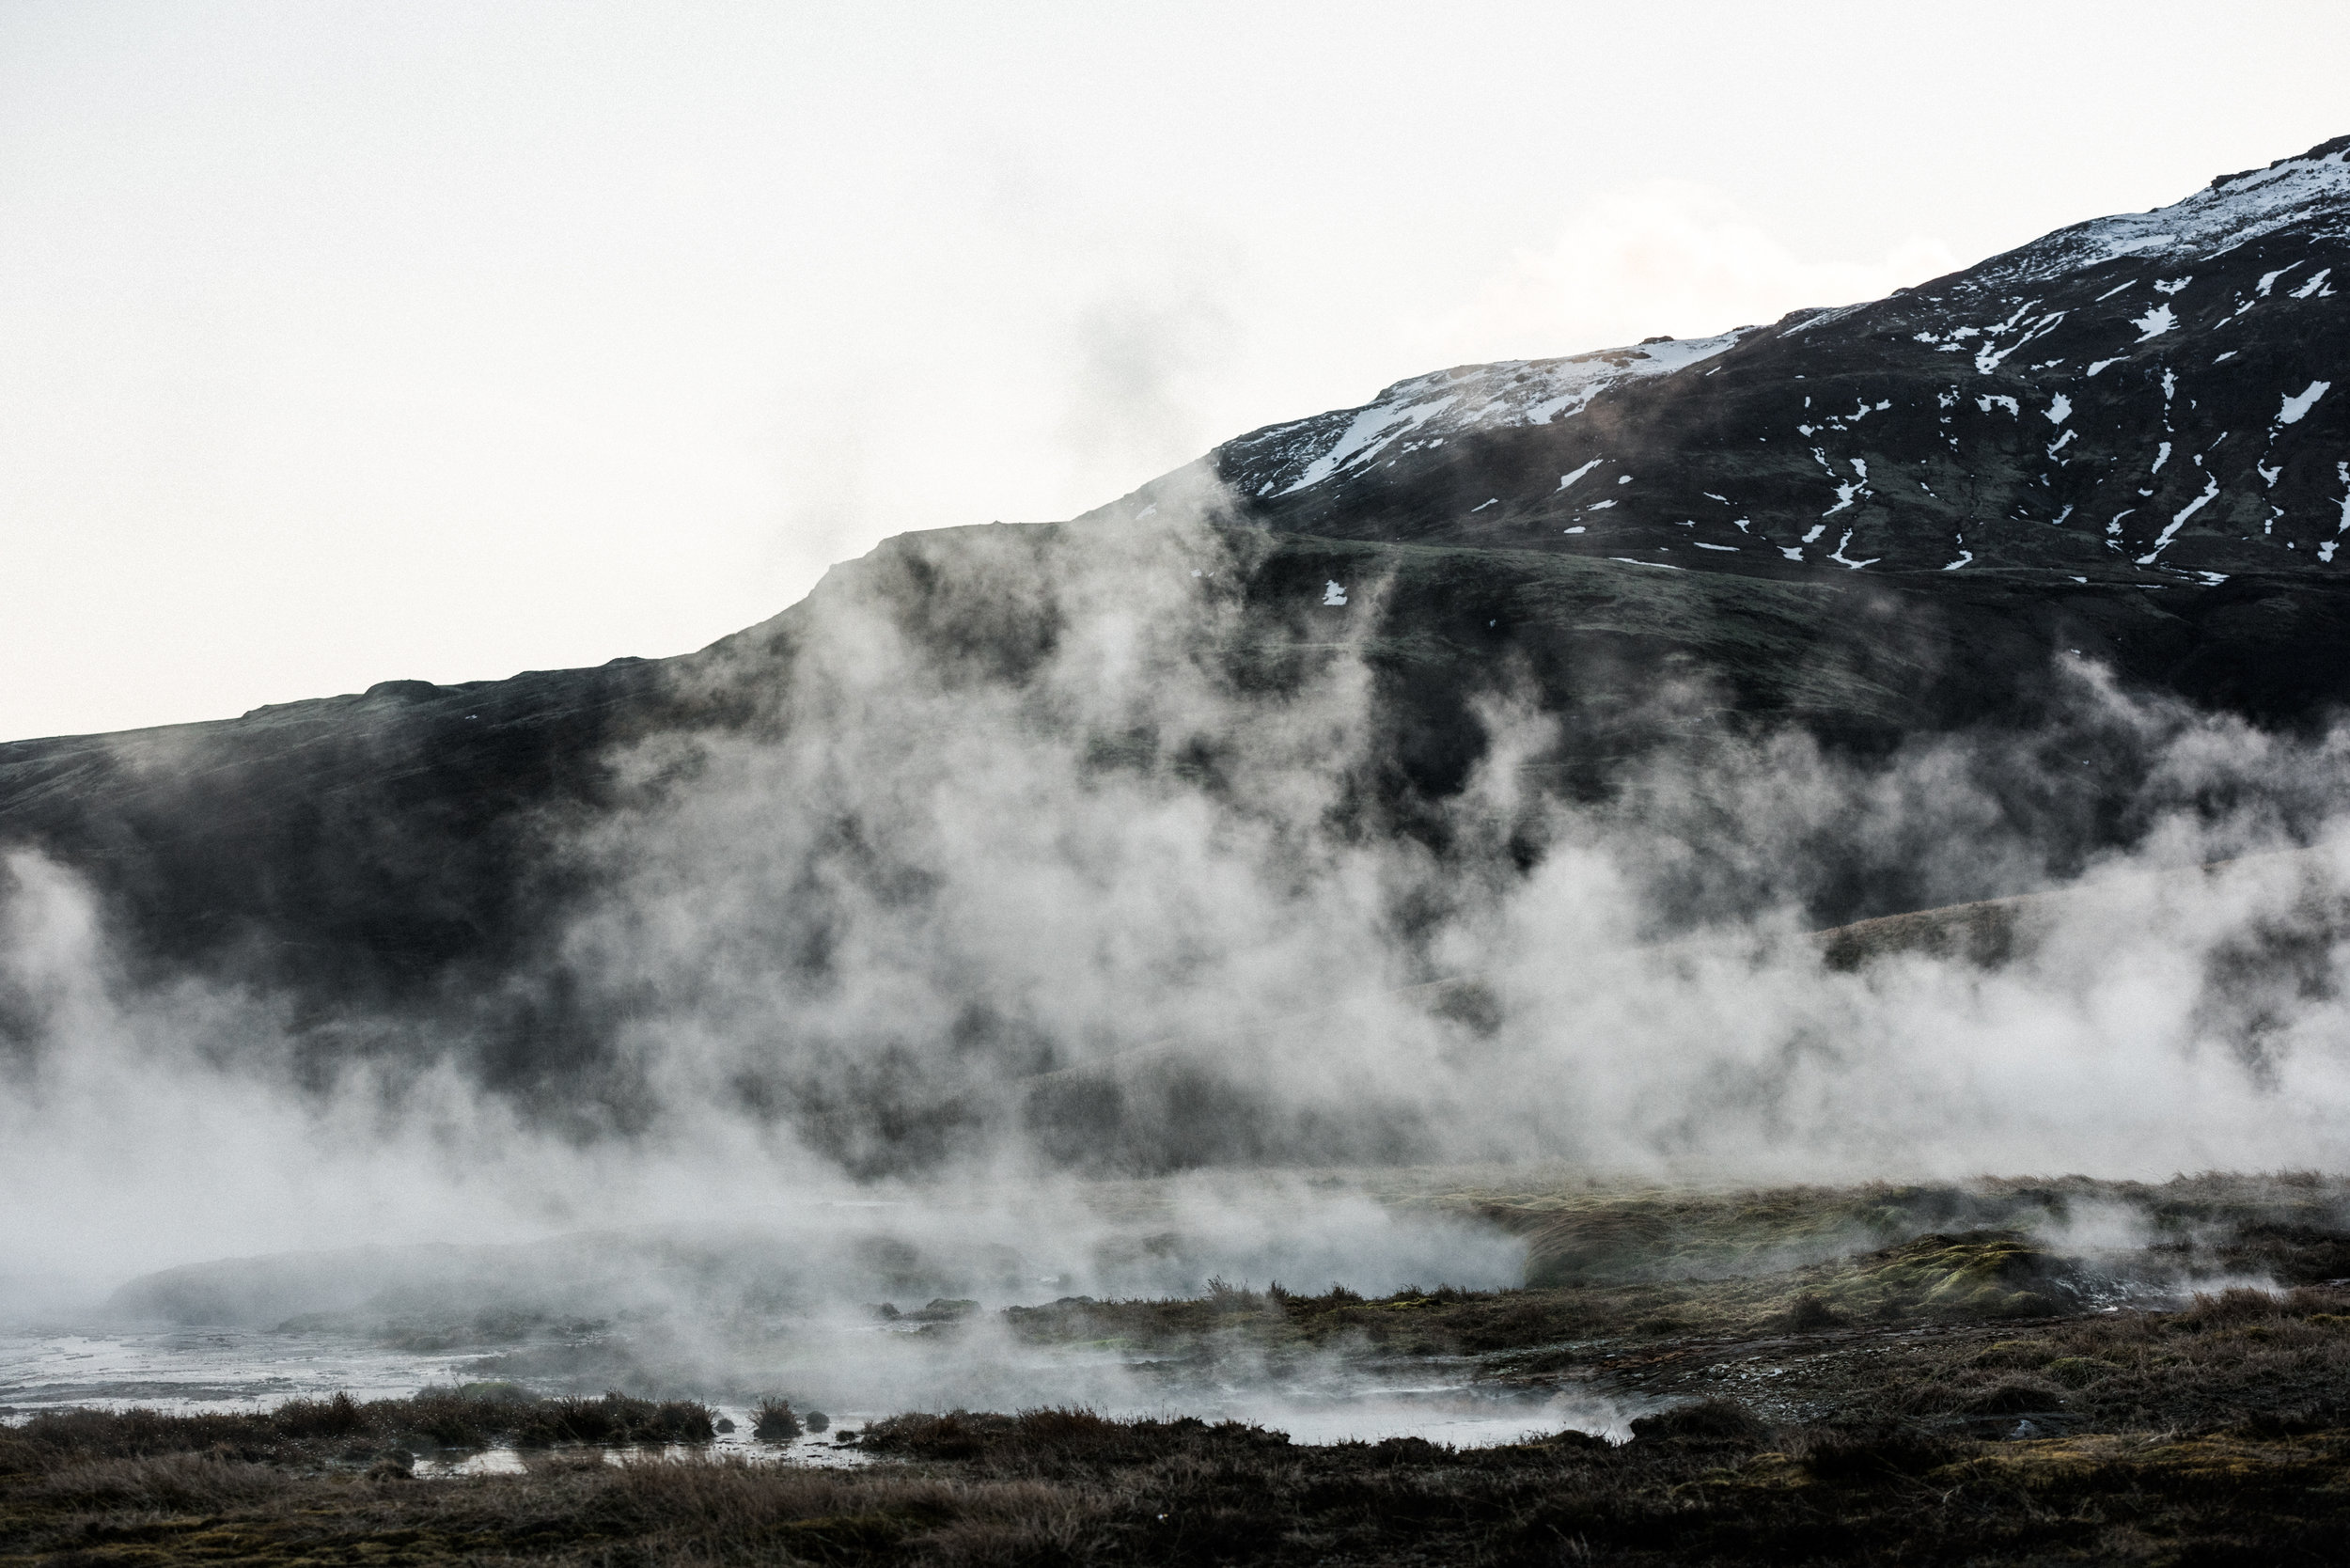 ICELAND_WOMAN_PHOTOGRAPHER_TARASHUPE_OUTDOOR_PHOTOGRAPHY_143.jpg